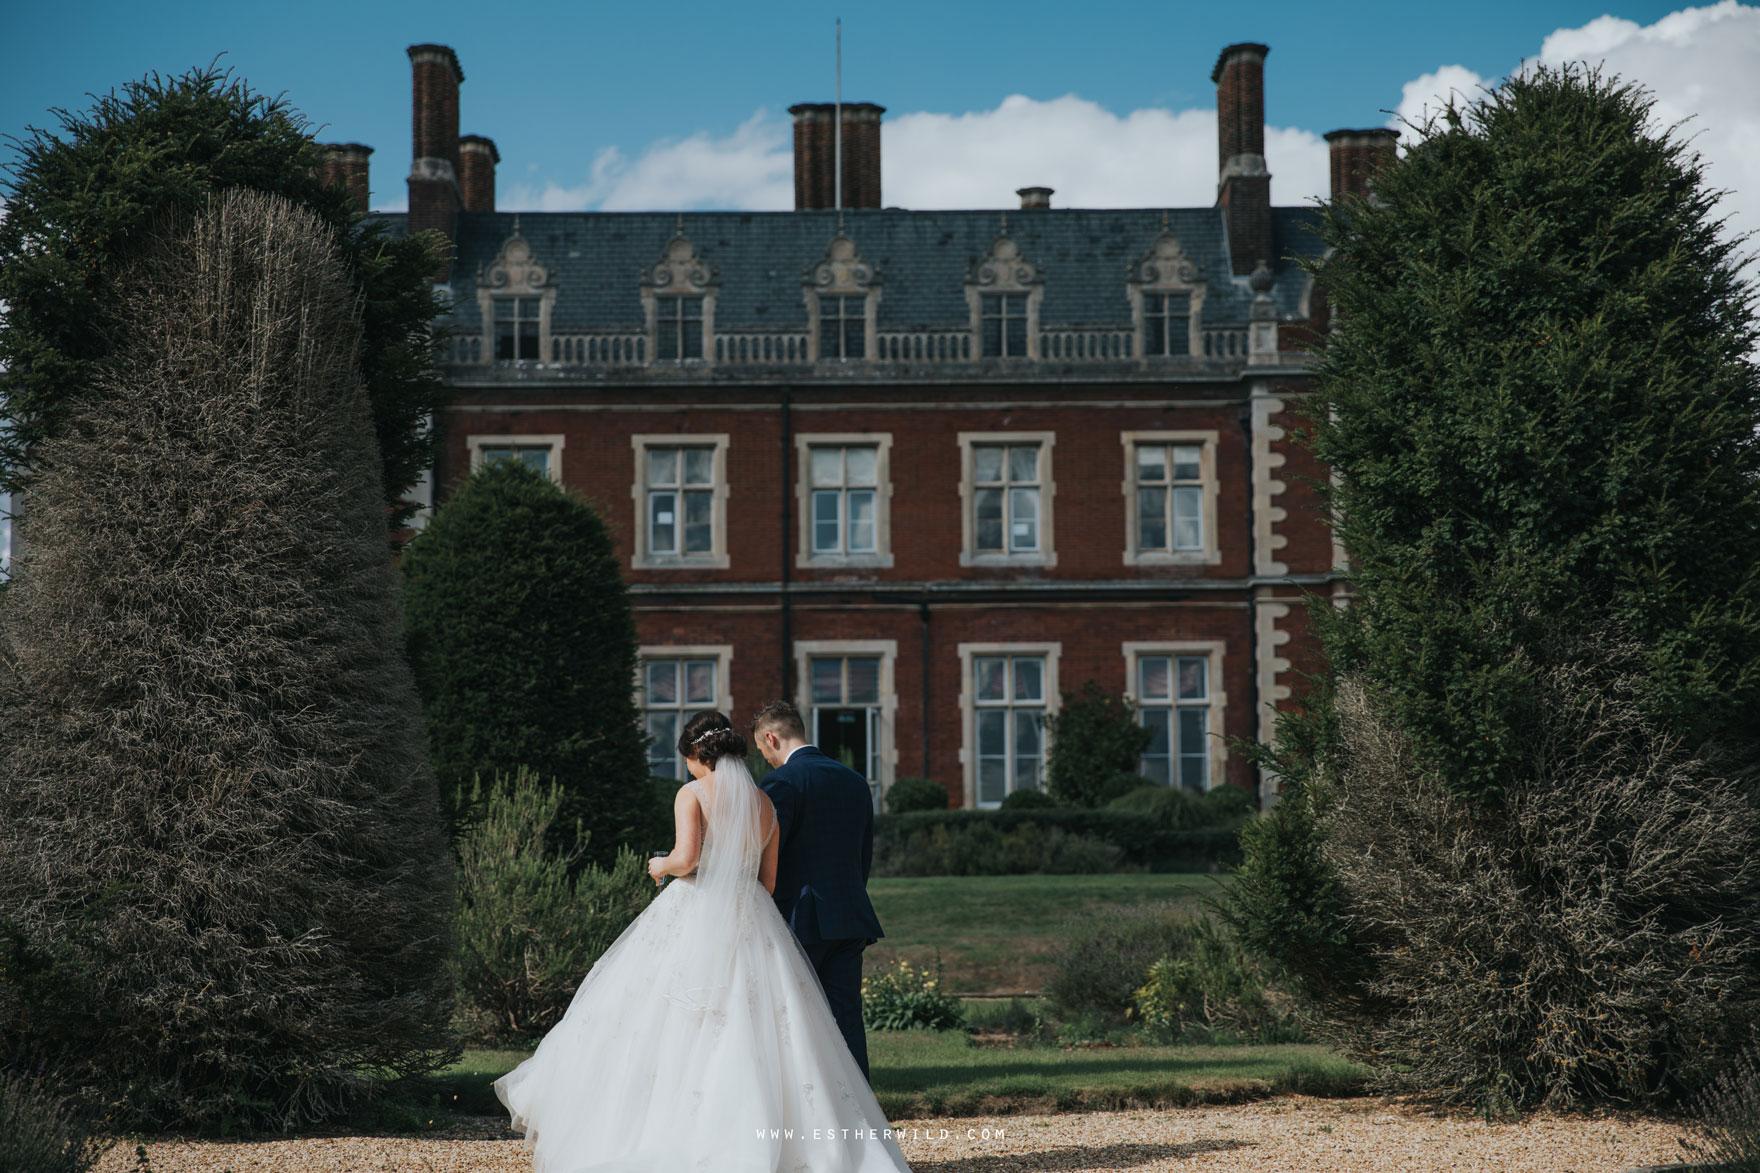 Lynford_Hall_Wedding_Thetford_Mundford_Esther_Wild_Photographer_IMG_1777.jpg